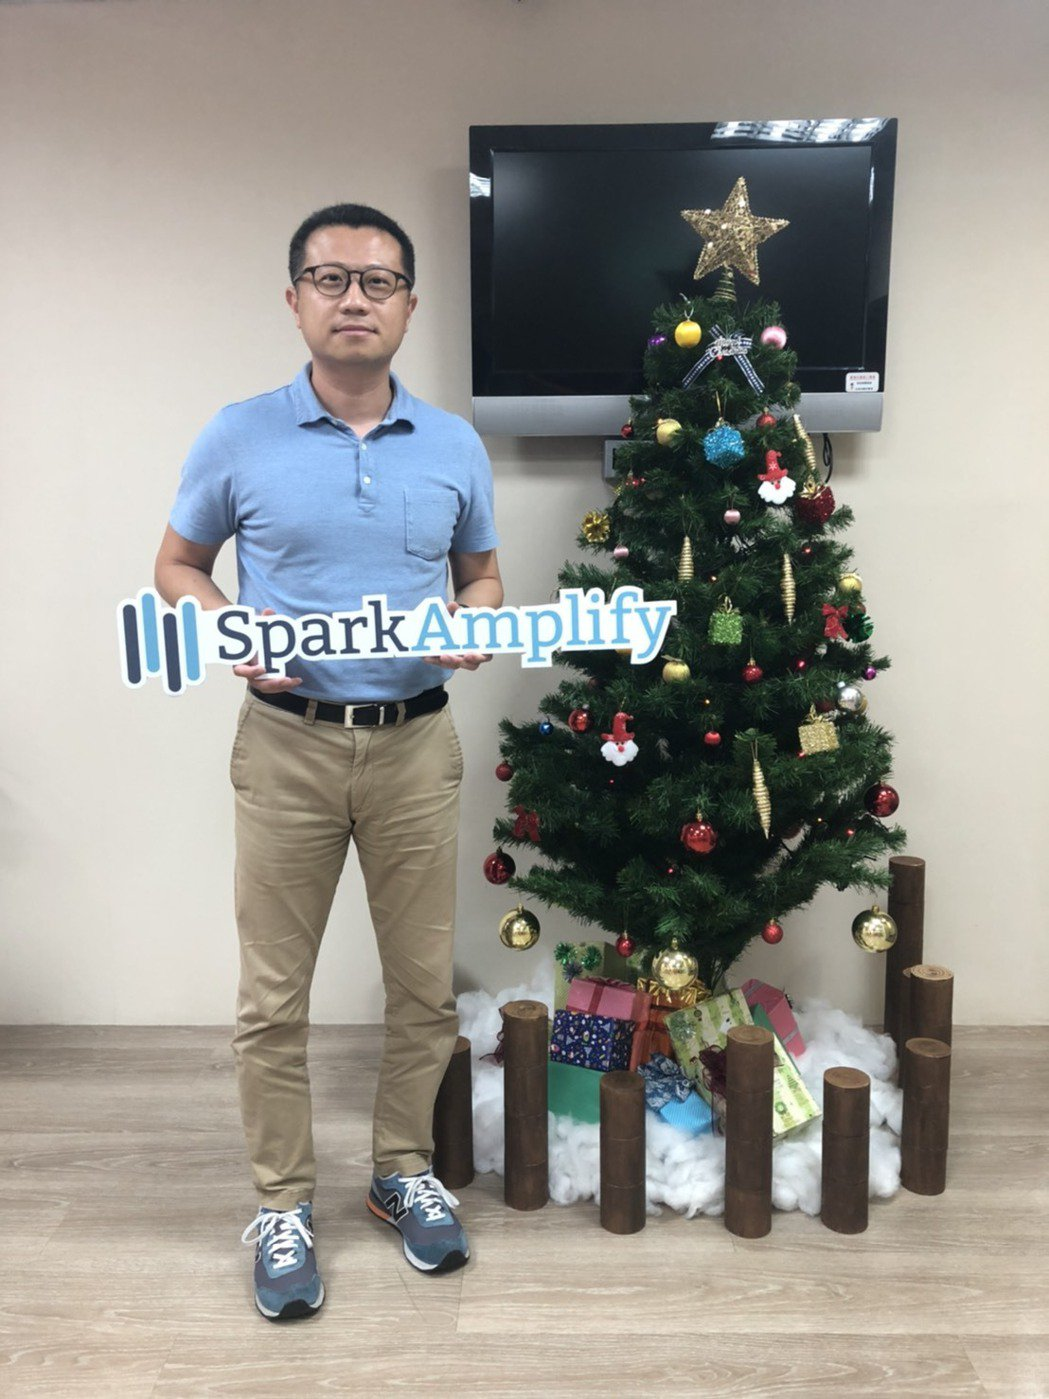 SparkAmplify執行長李健群表示,「媒體在找新聞、企業在找媒體」。 Sp...